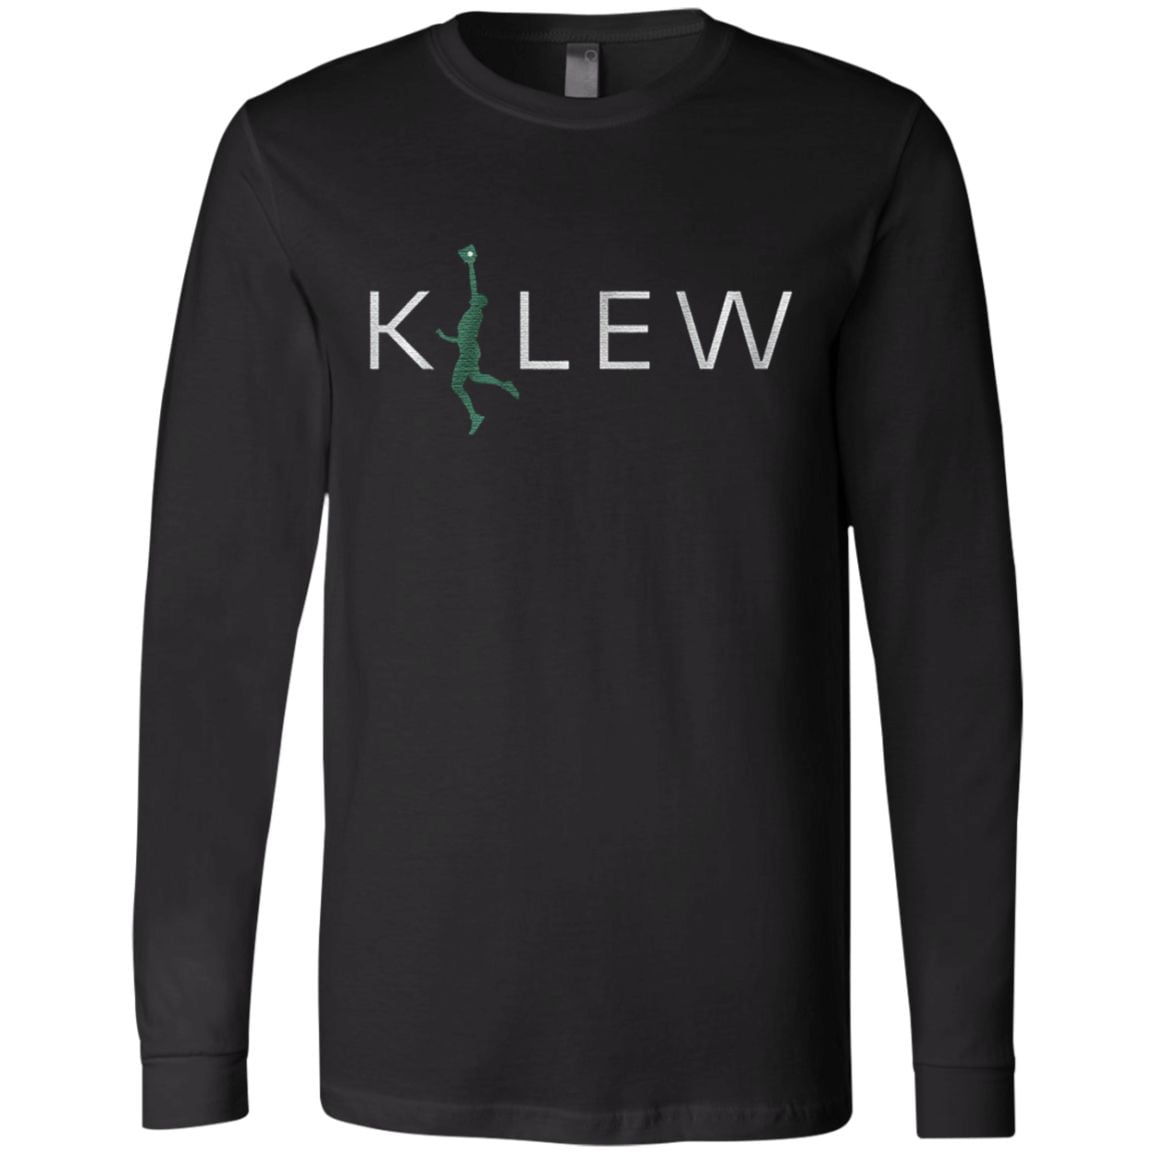 Kyle Lewis T Shirt